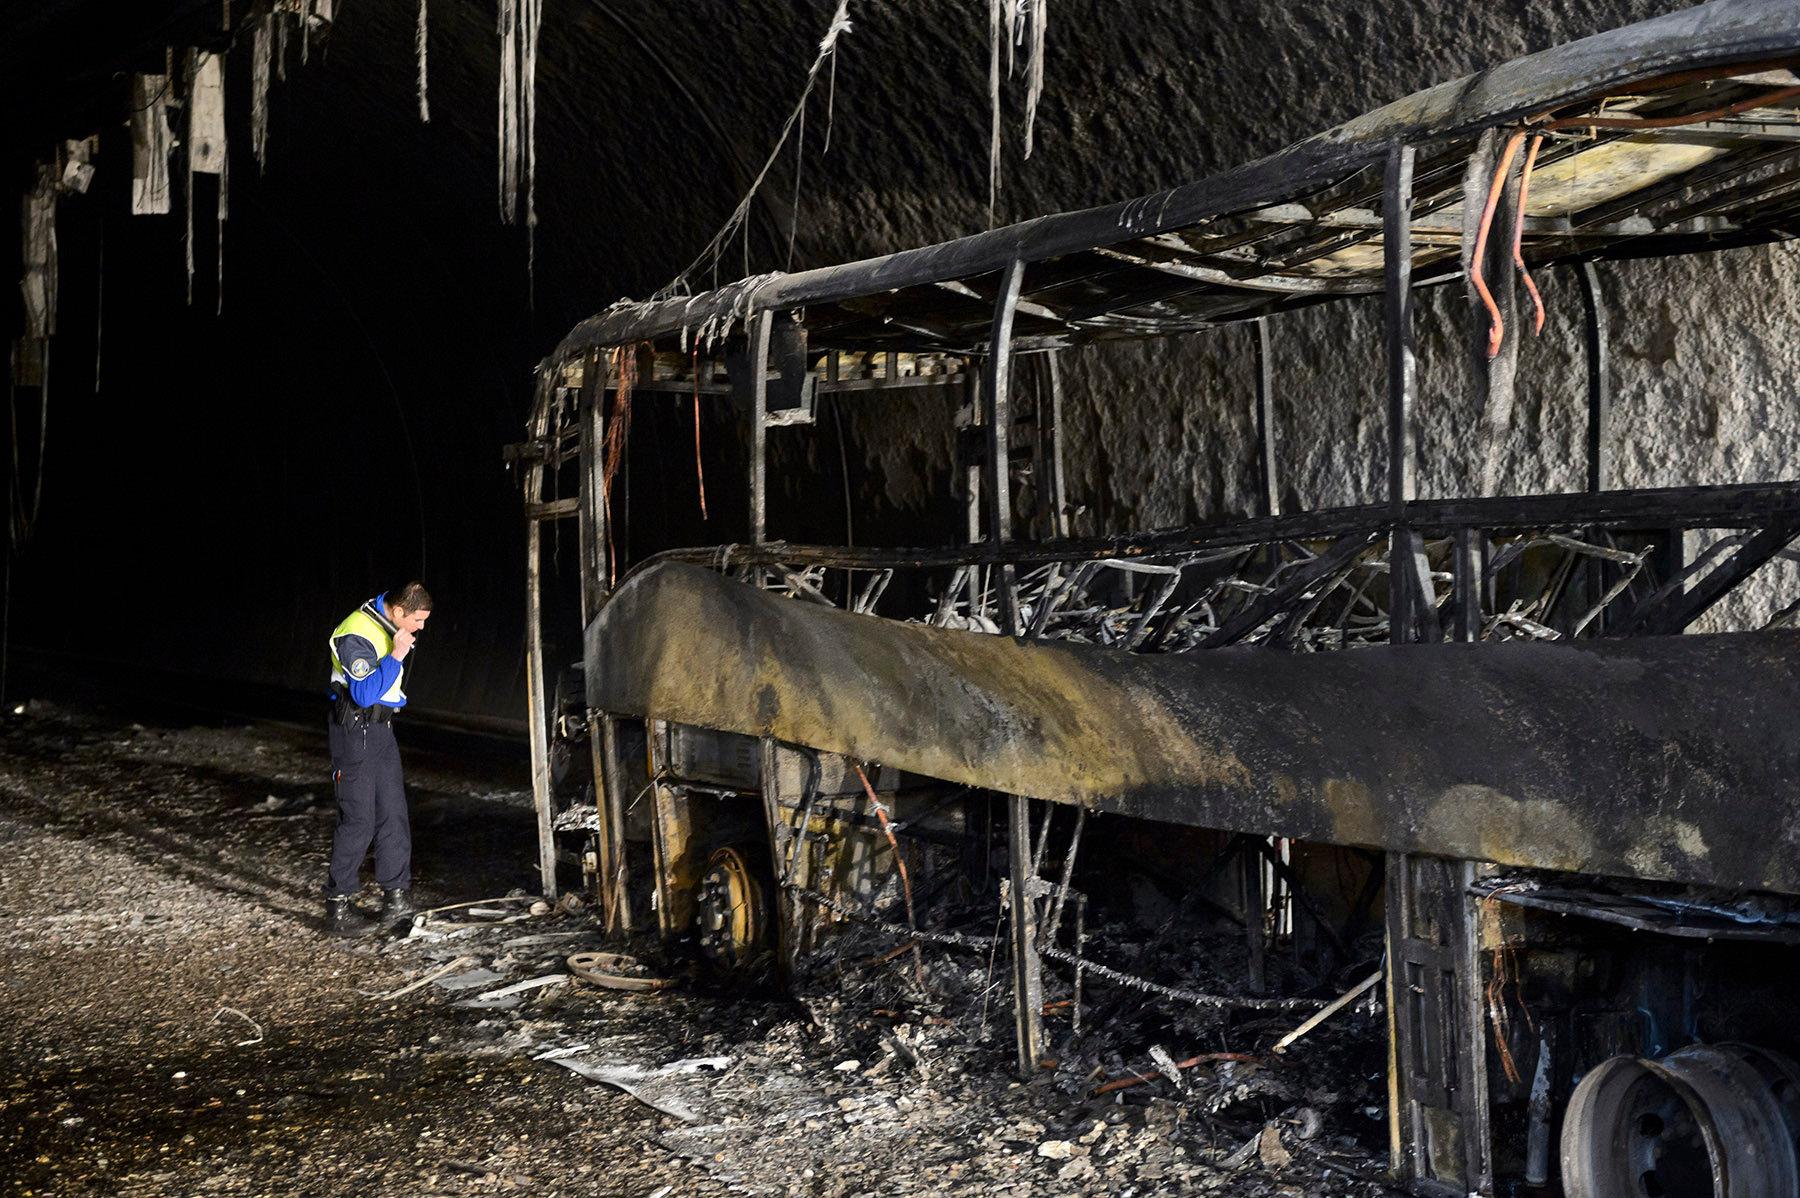 Incendie car tunnel - 2014